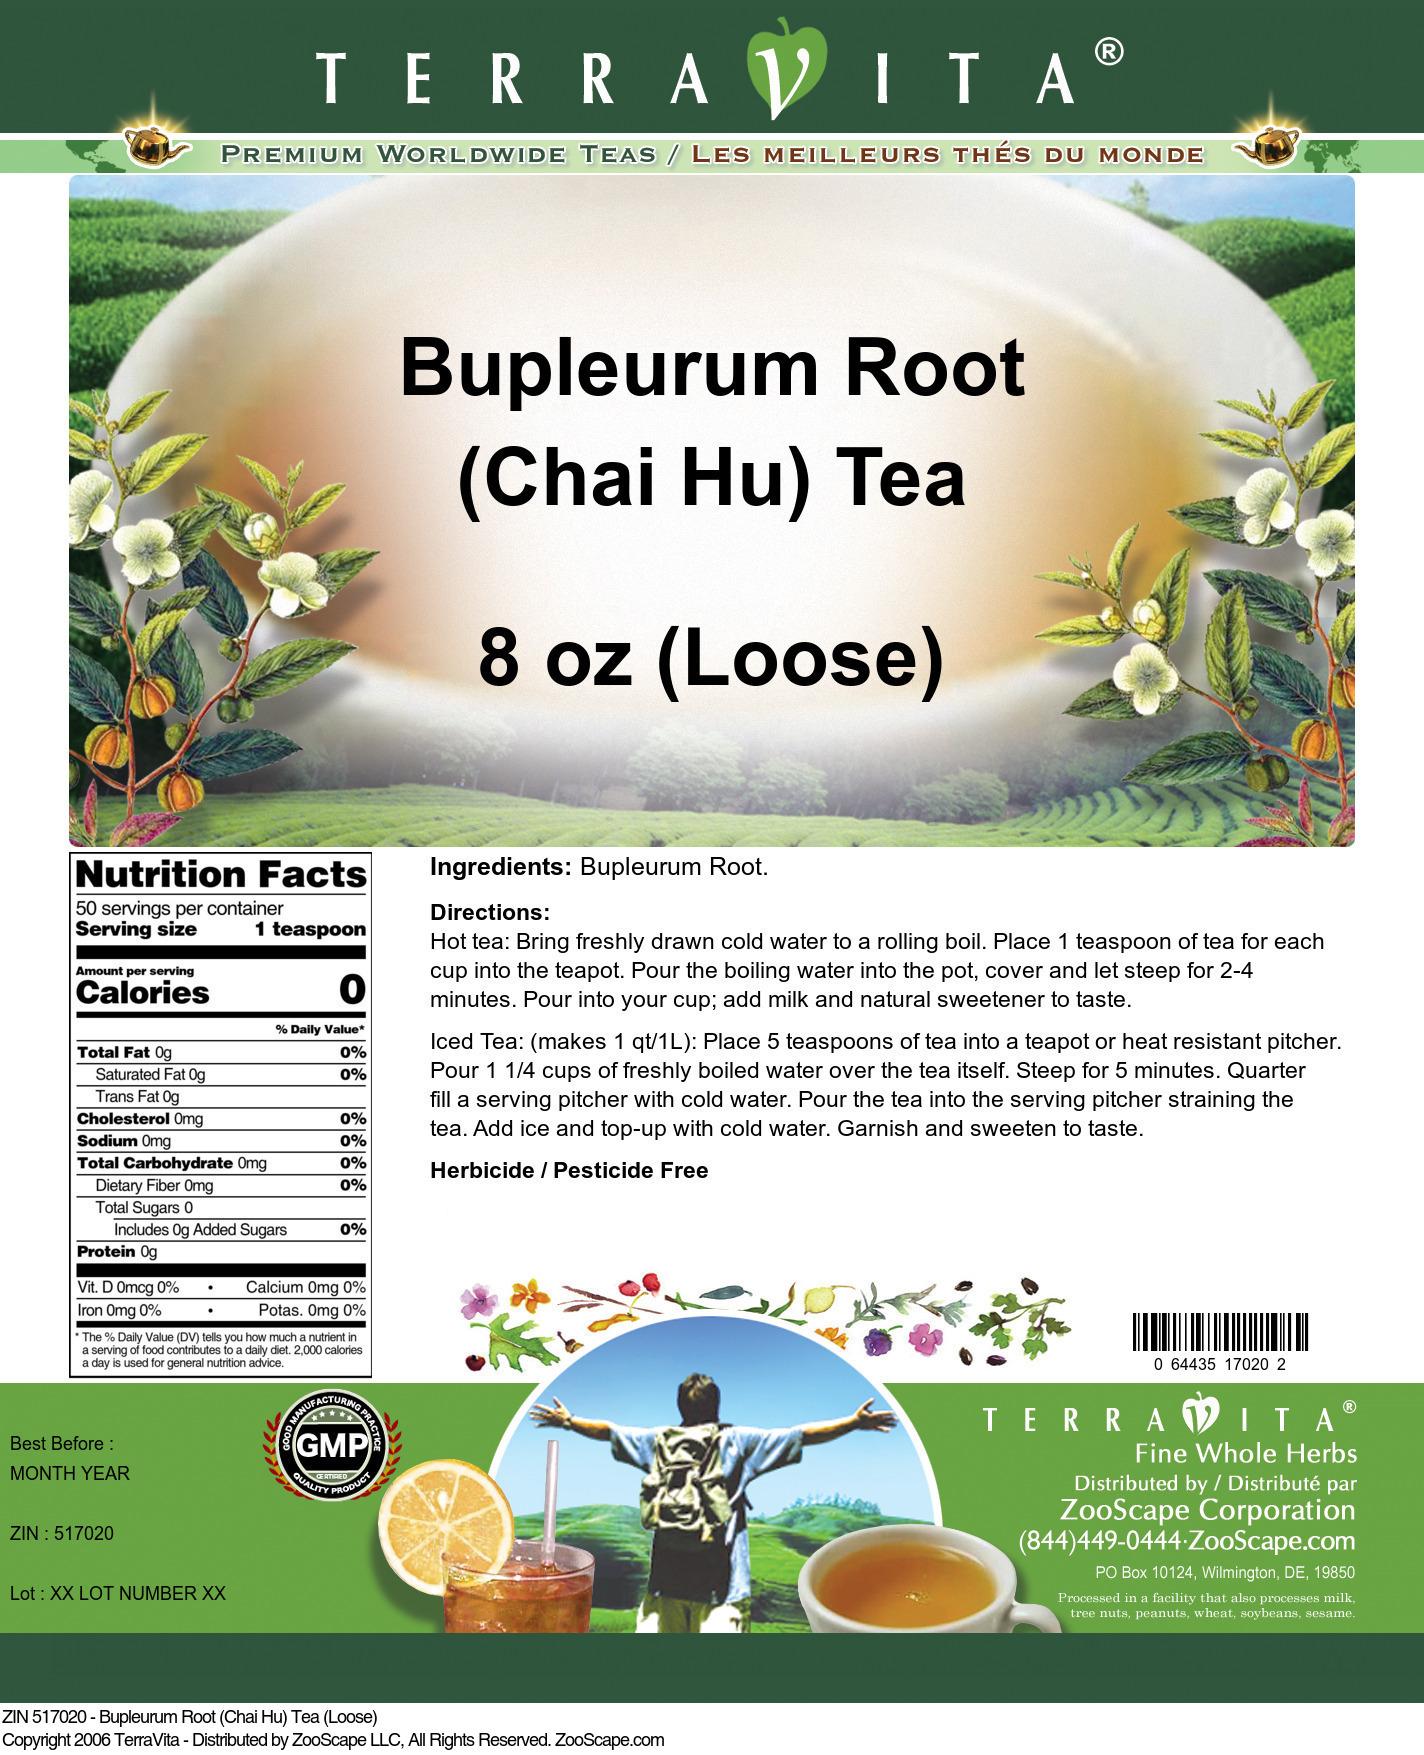 Bupleurum Root (Chai Hu) Tea (Loose)